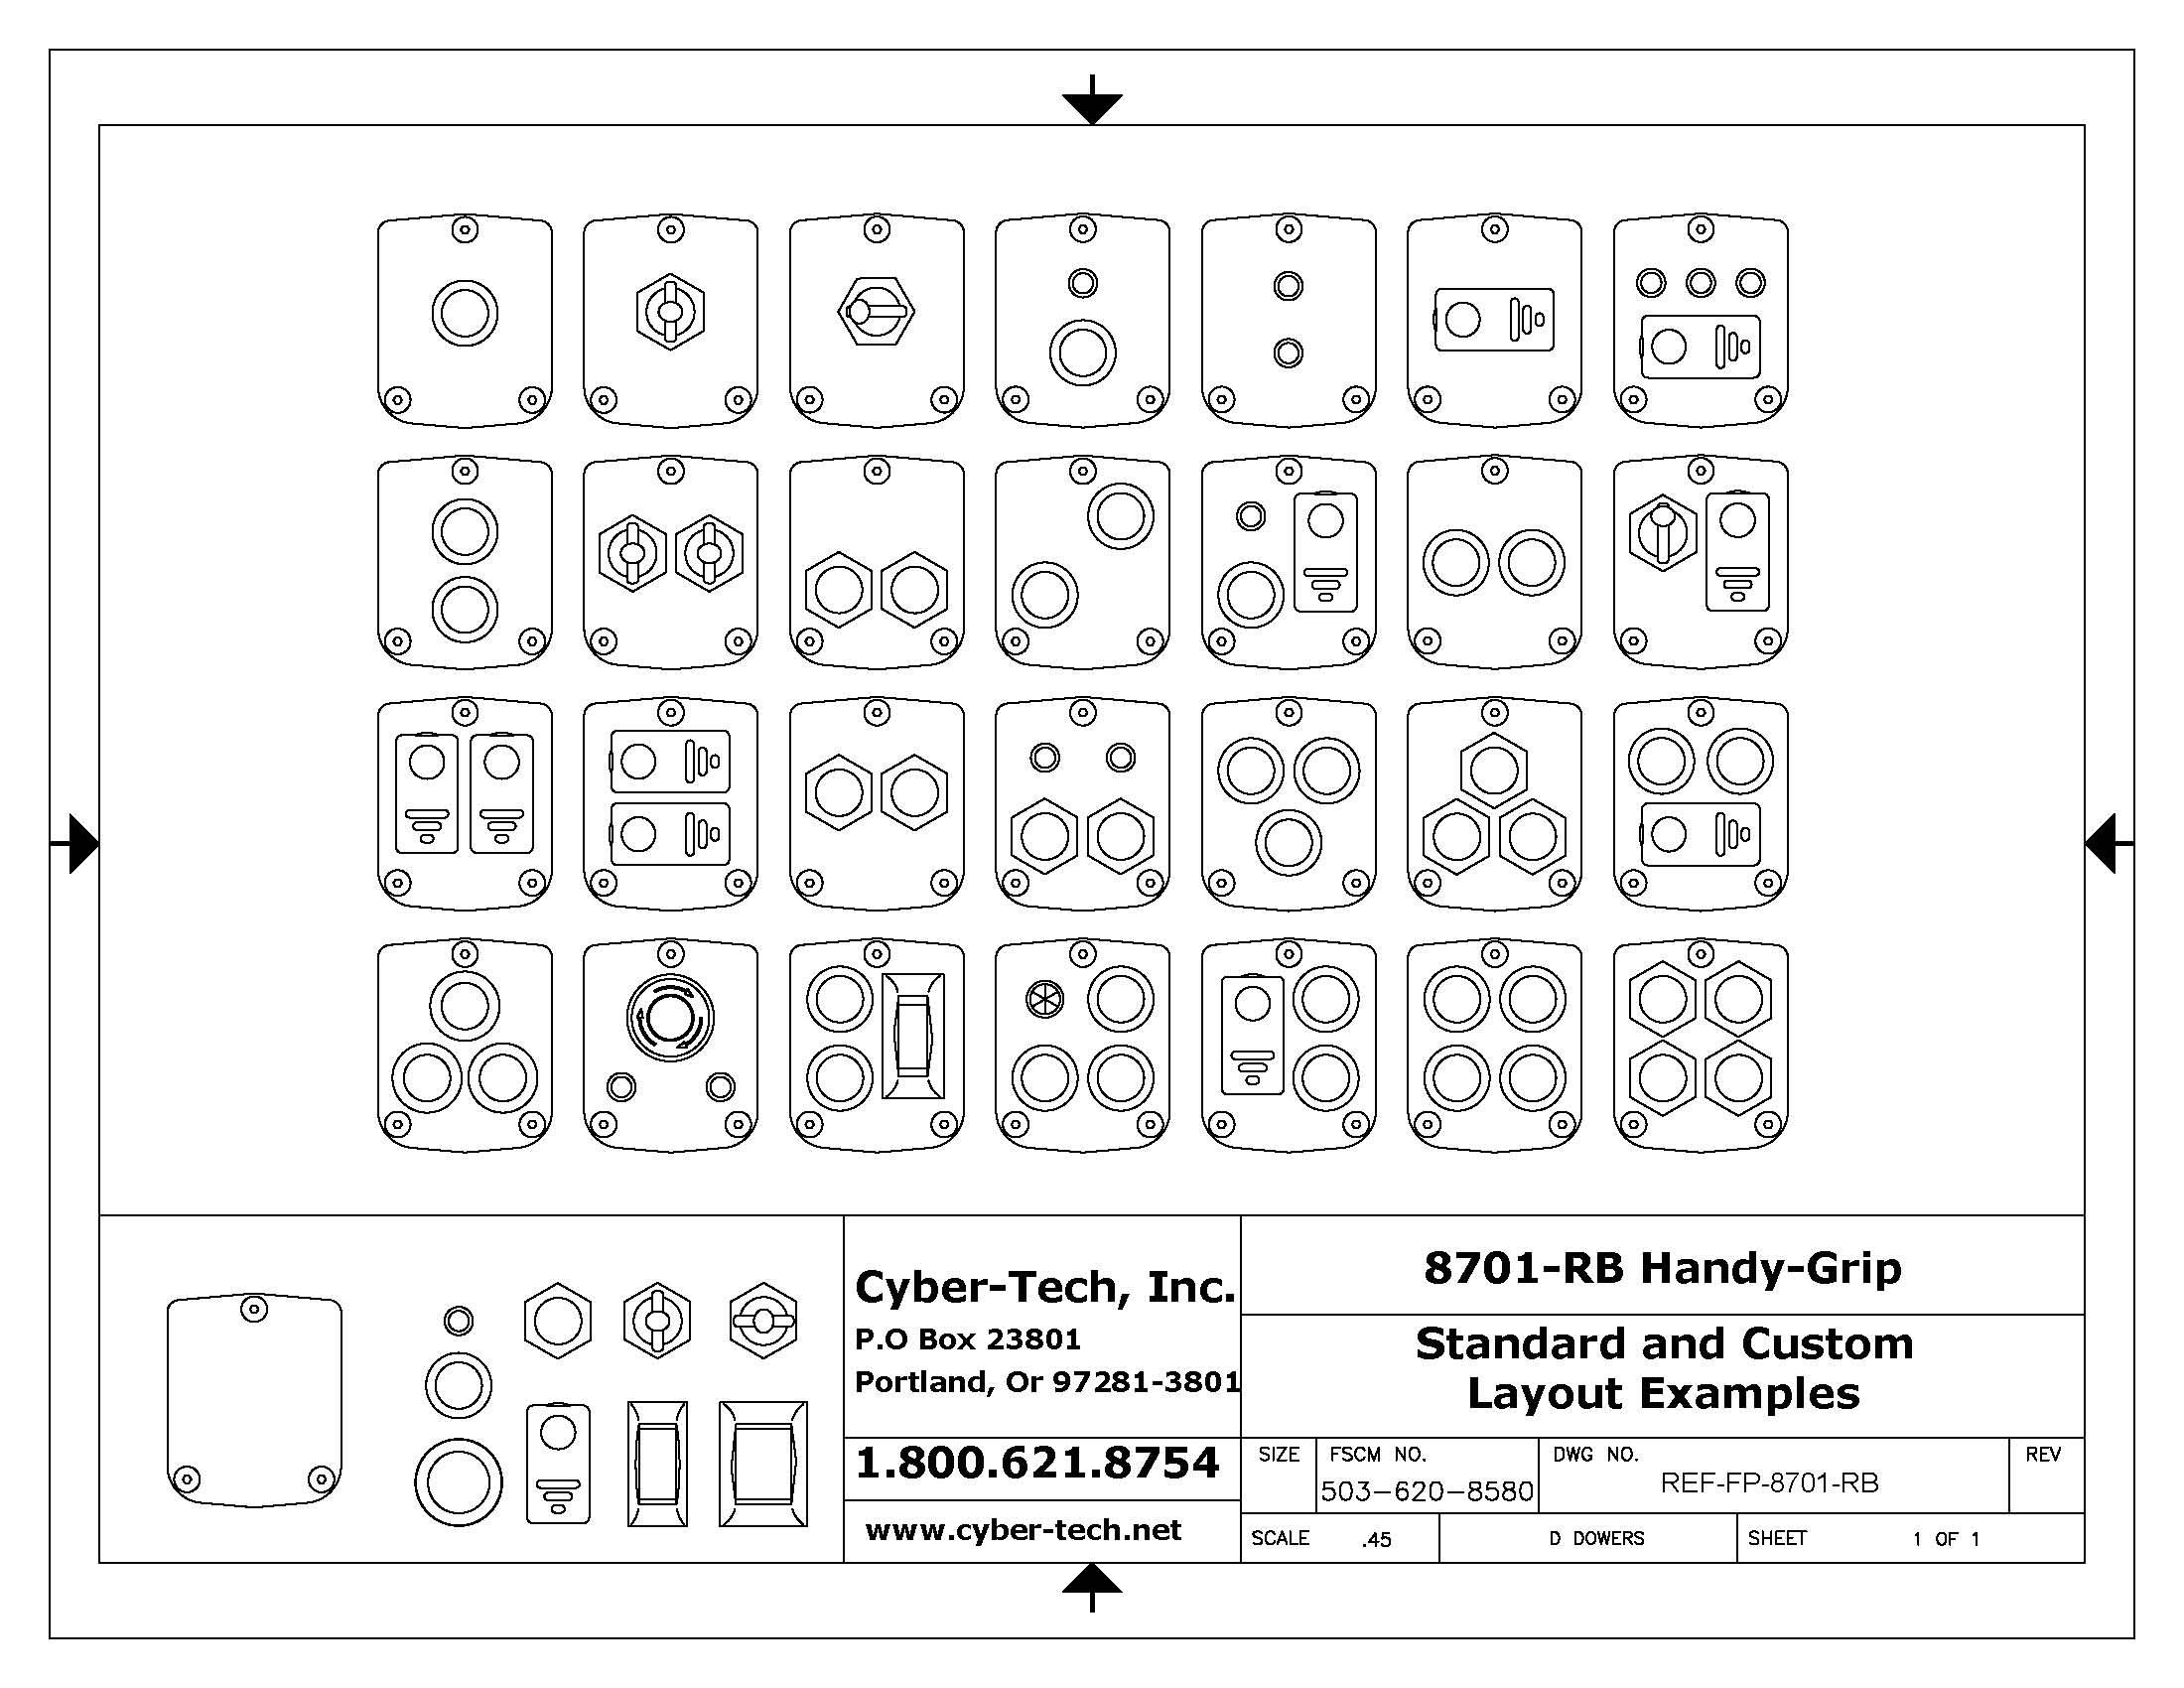 8701-RB_Standard_Custom_Layouts.jpg